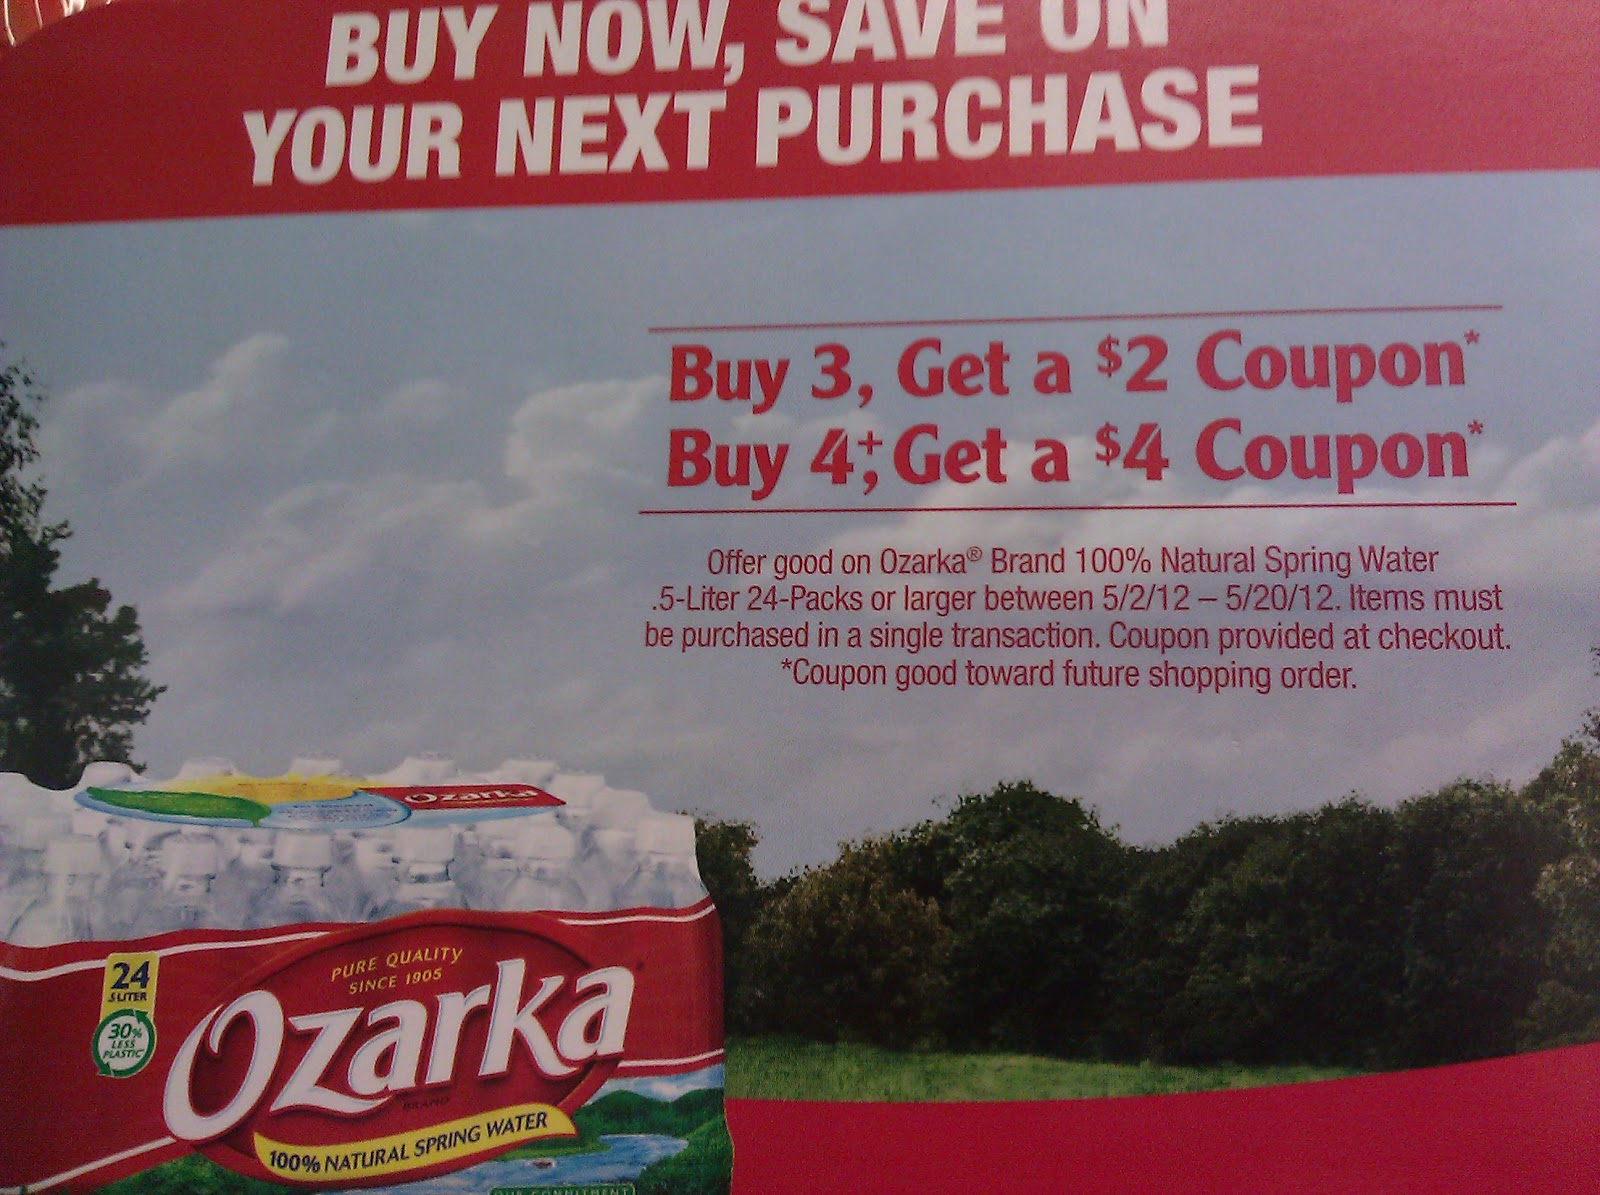 Ozarka coupons